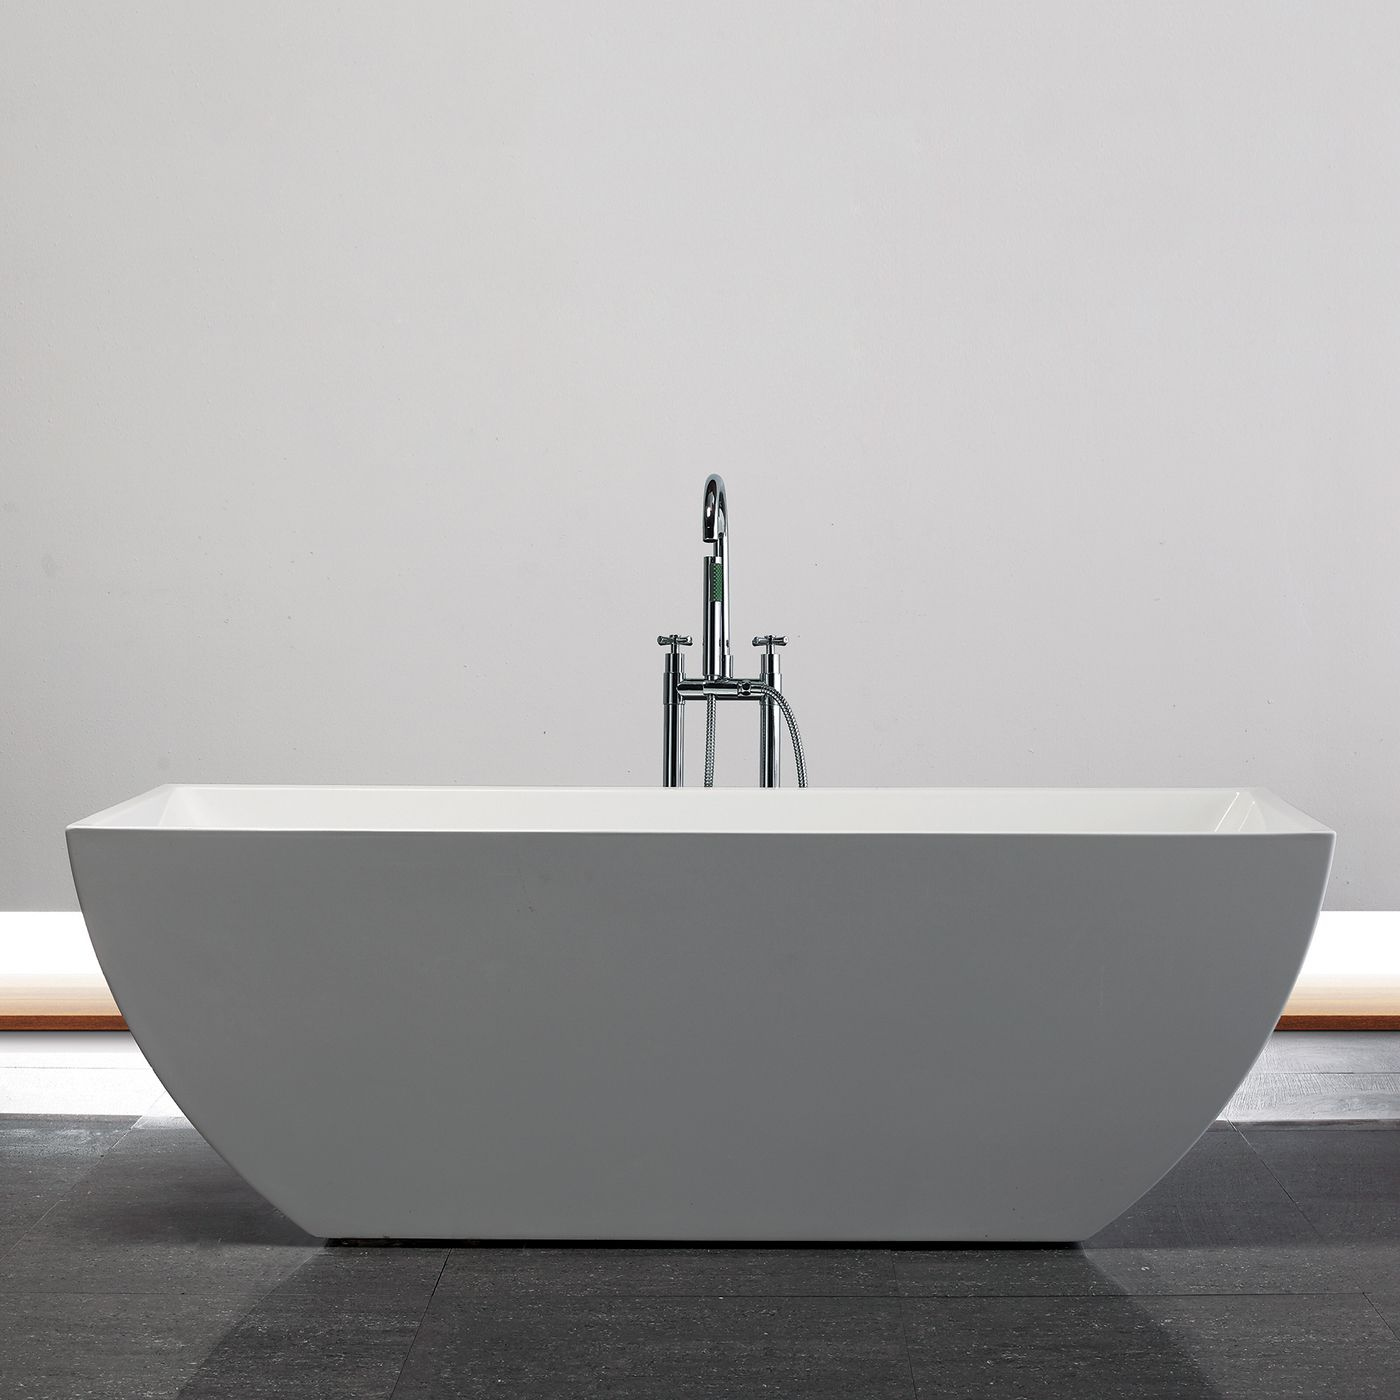 77g Jade Bath Blw1821 French Riviera Annabelle